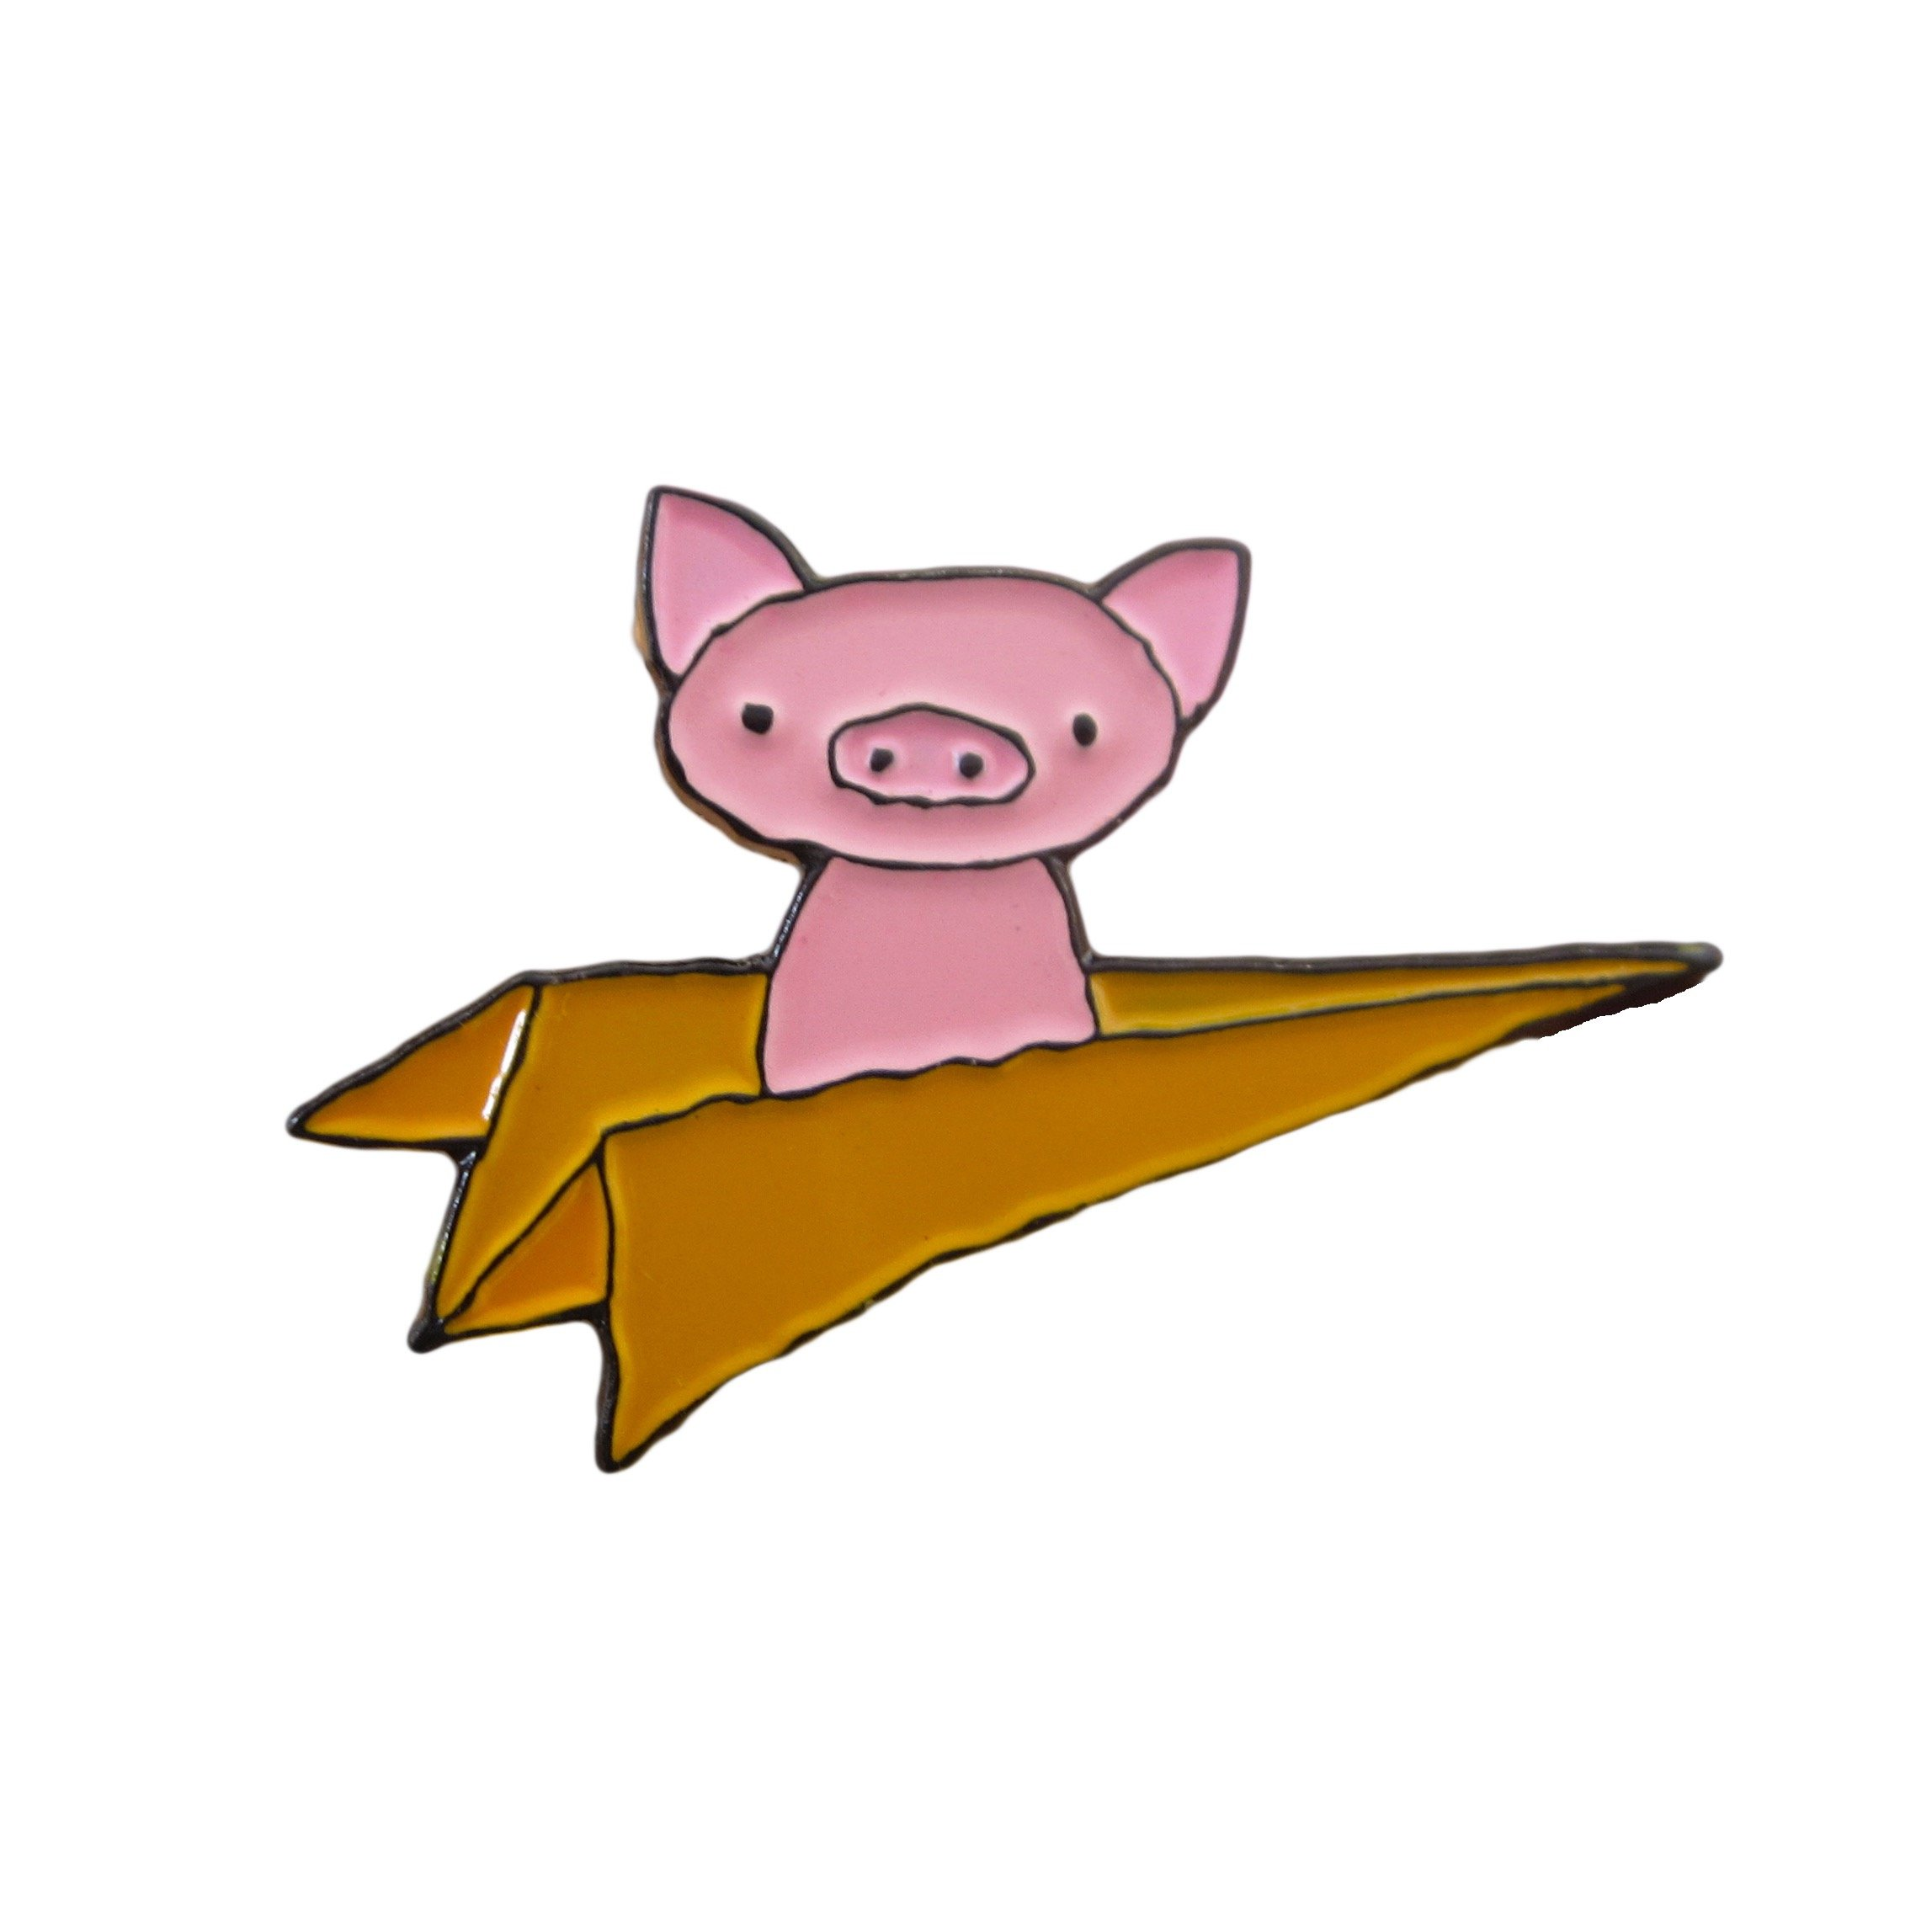 Mark Poulin Soft Enamel Pin, Flying Pig, Yellow